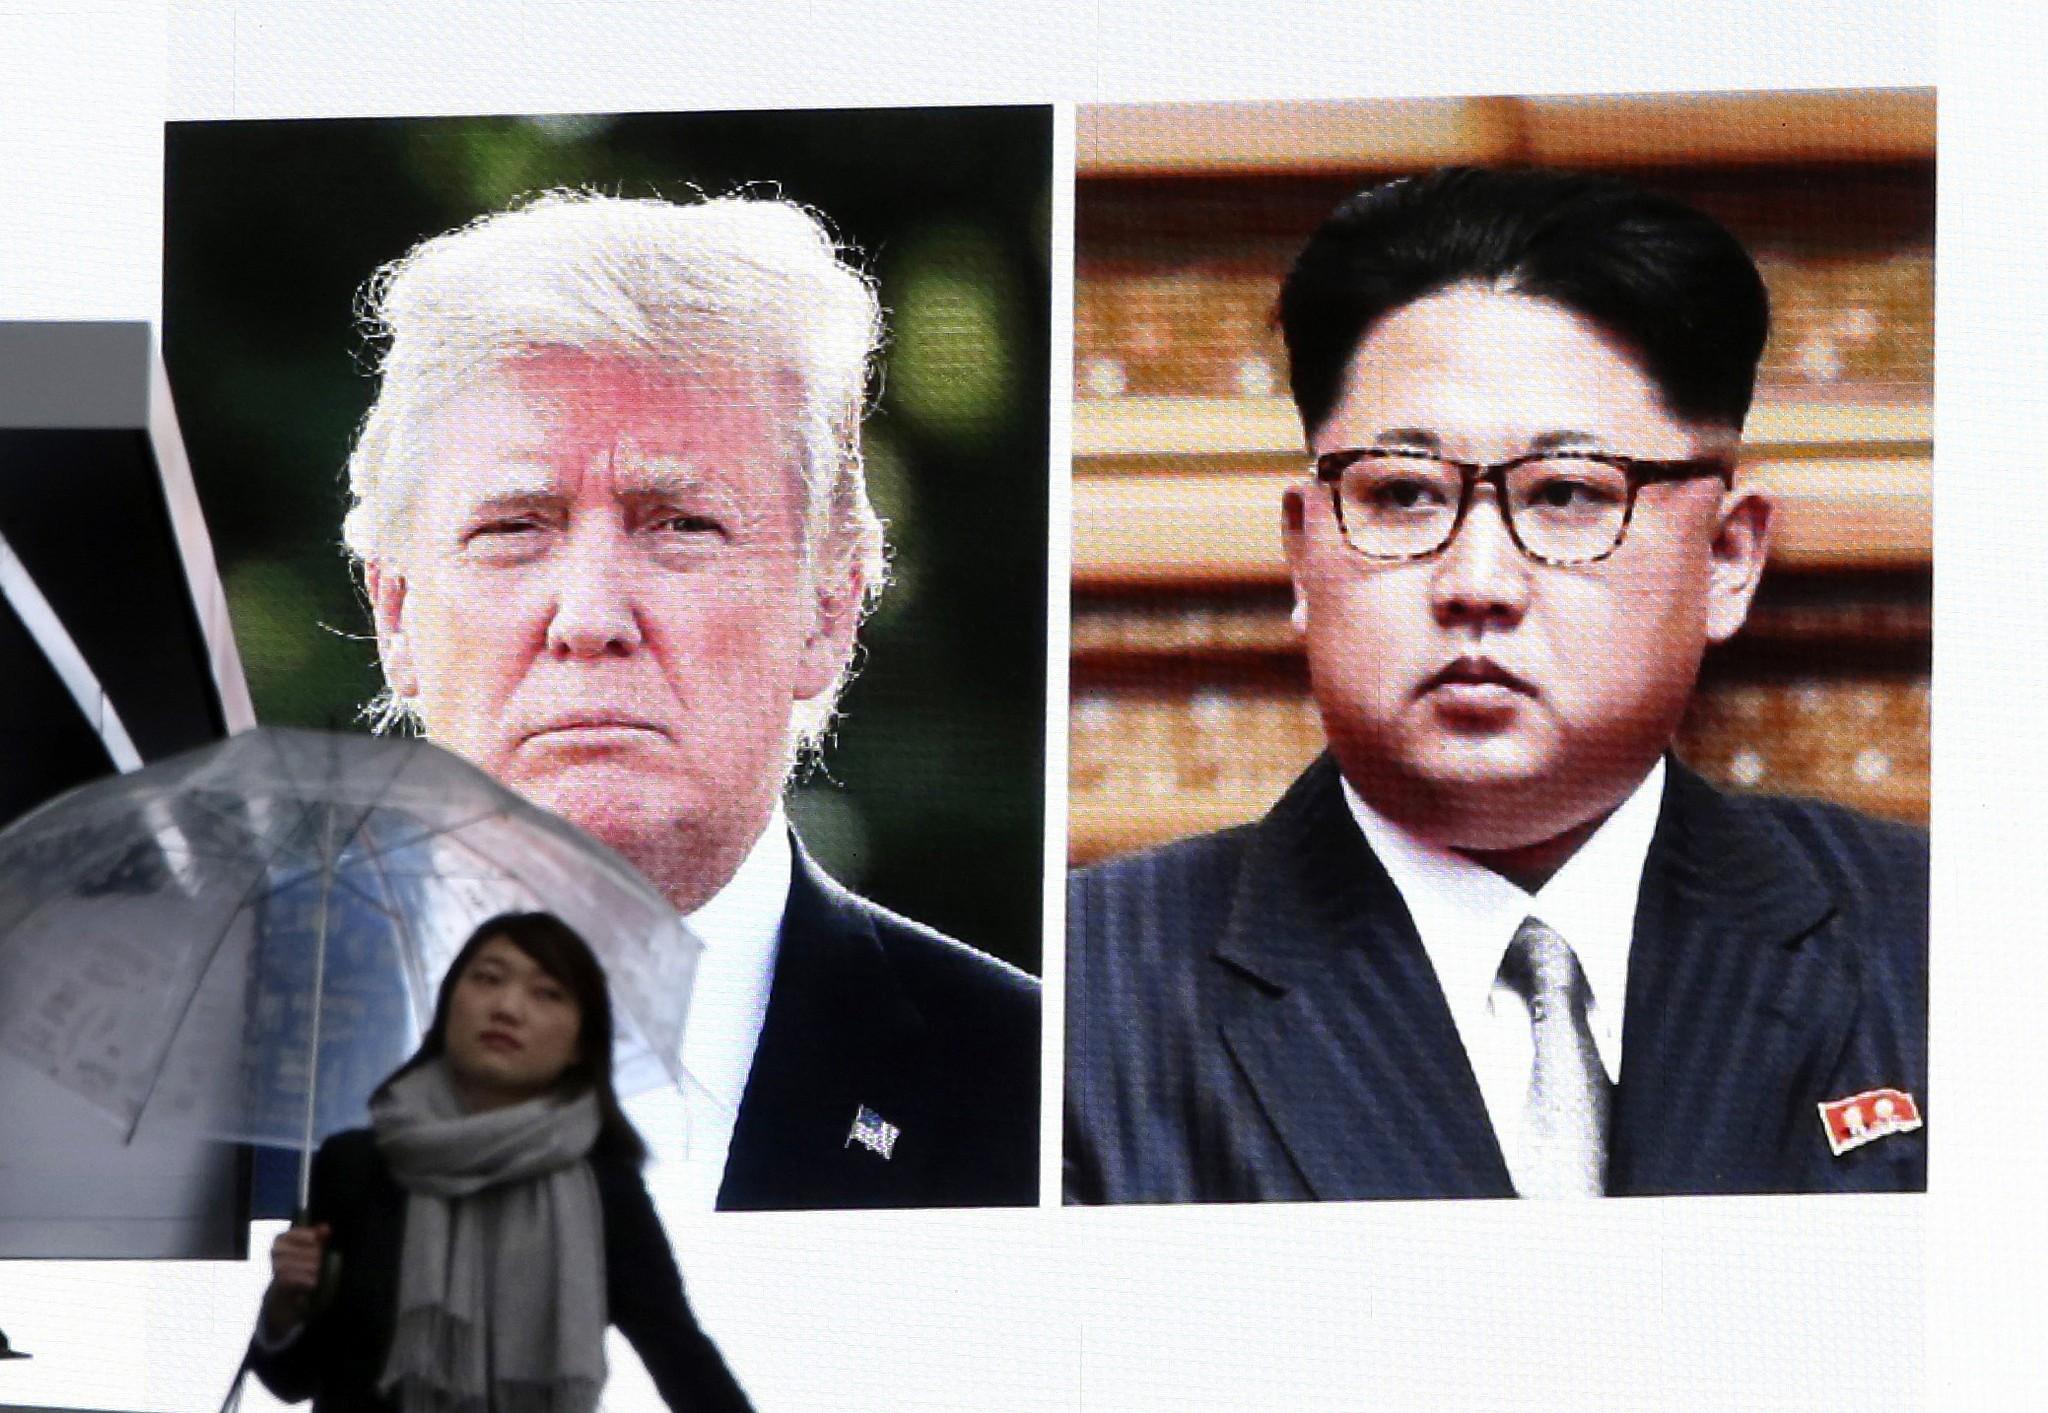 White House Puts an Asterisk on Trump, Kim Jong Un Meeting